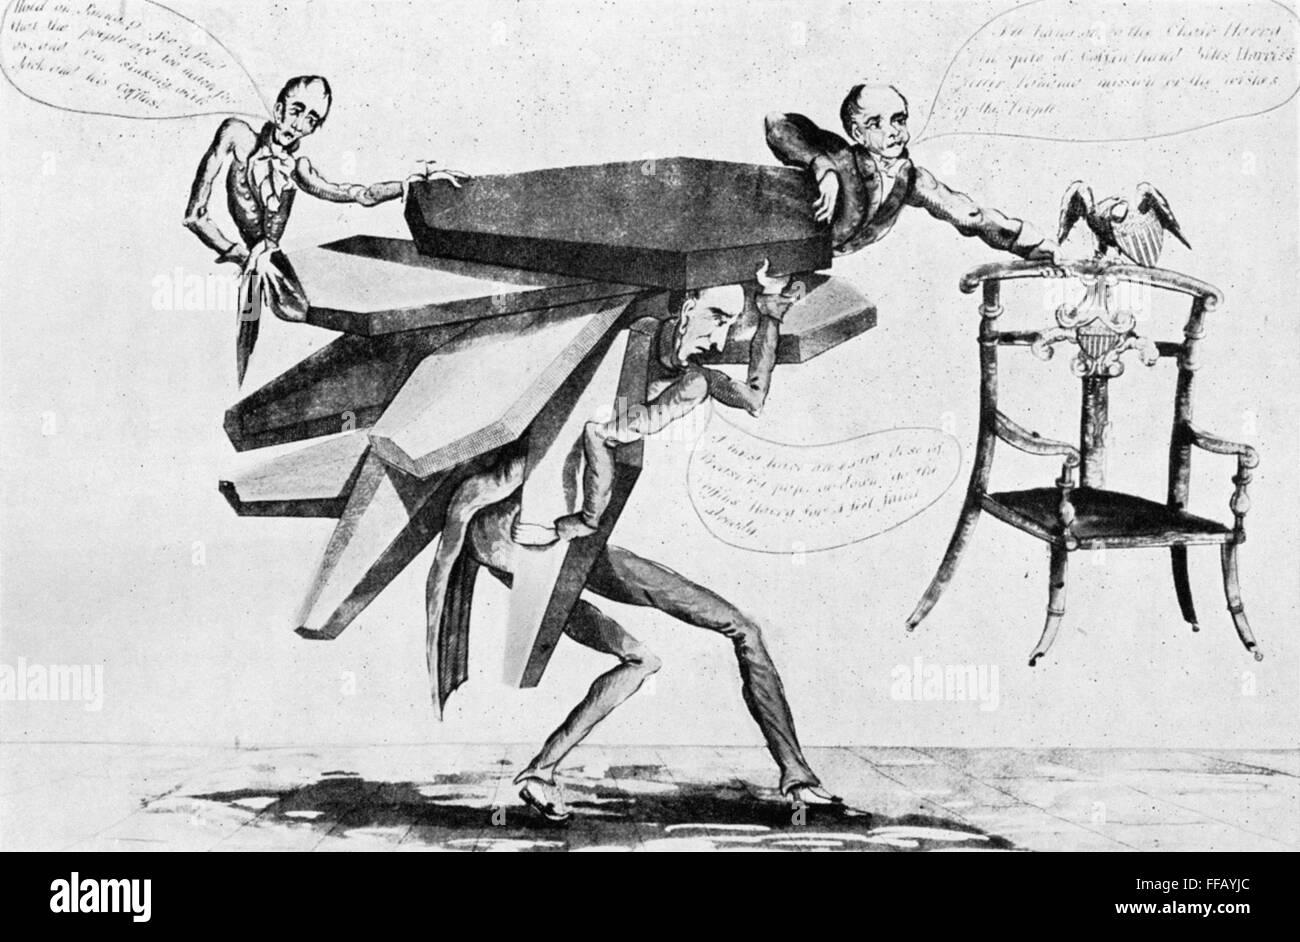 presidential election 1828 npresident john quincy adams clinging